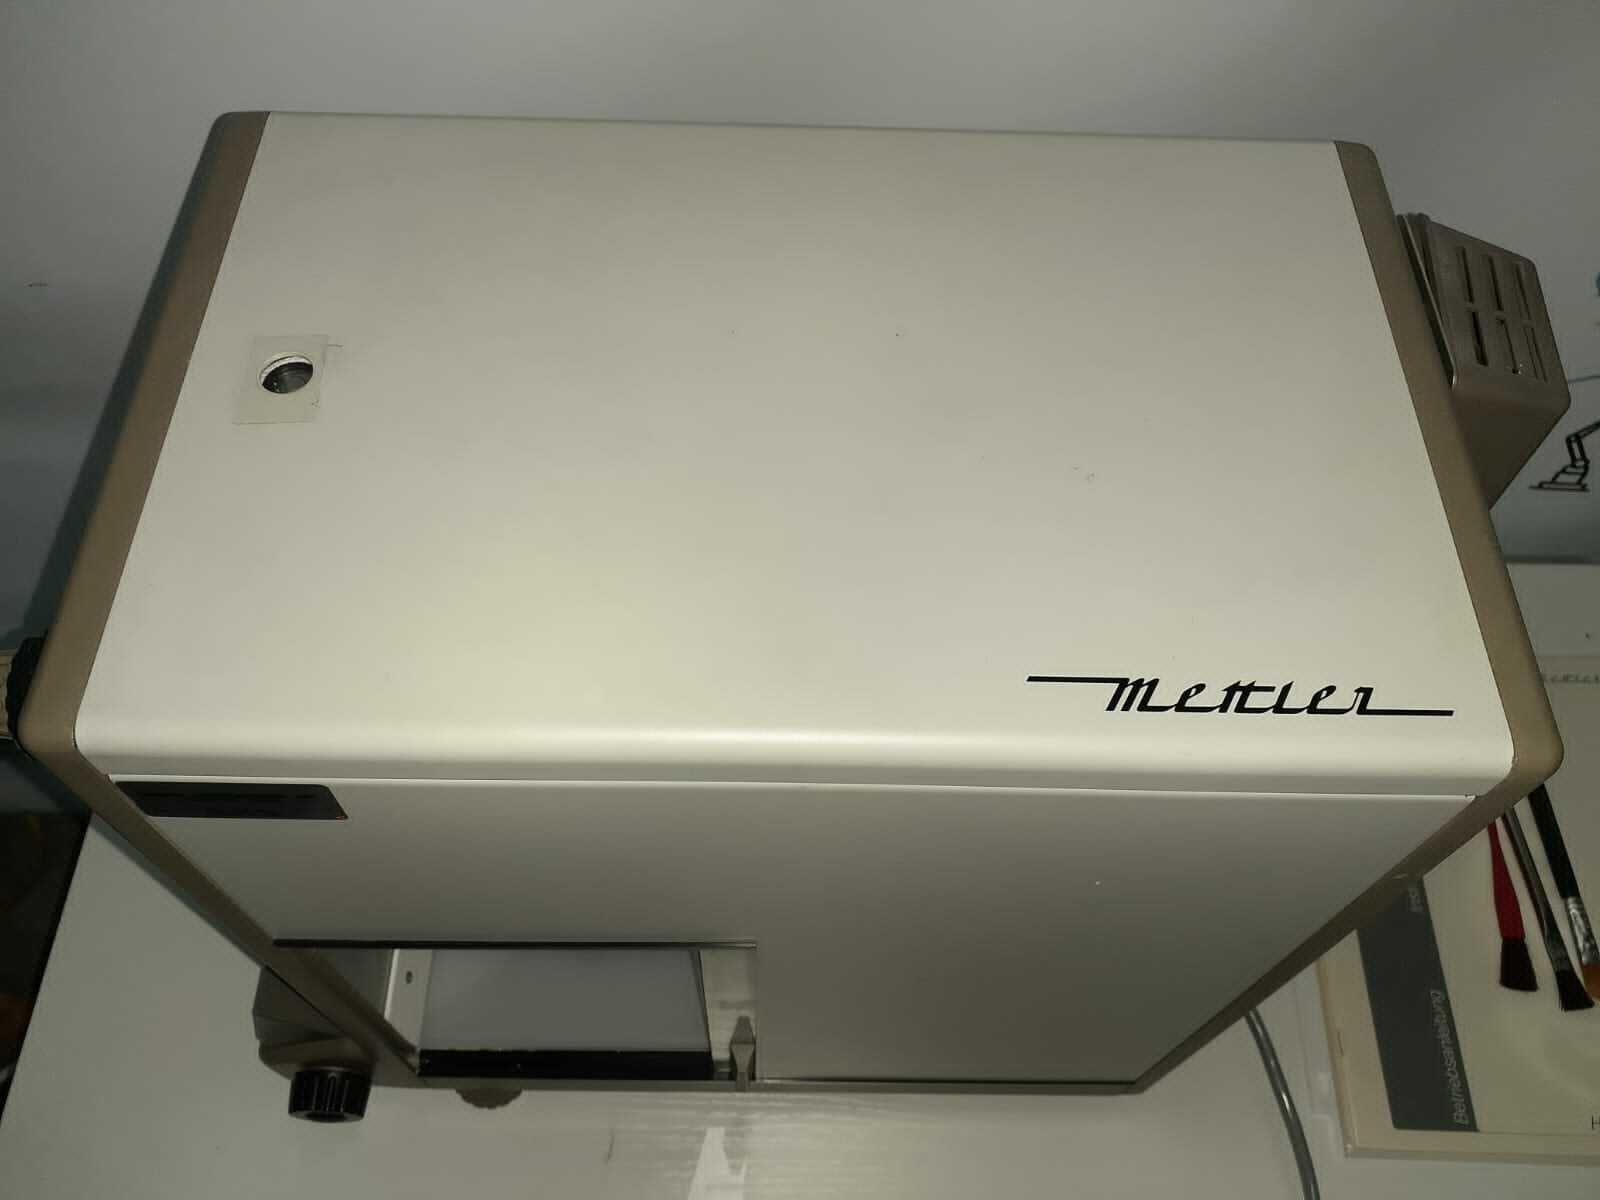 Mettler H51AR Laboratory Scale